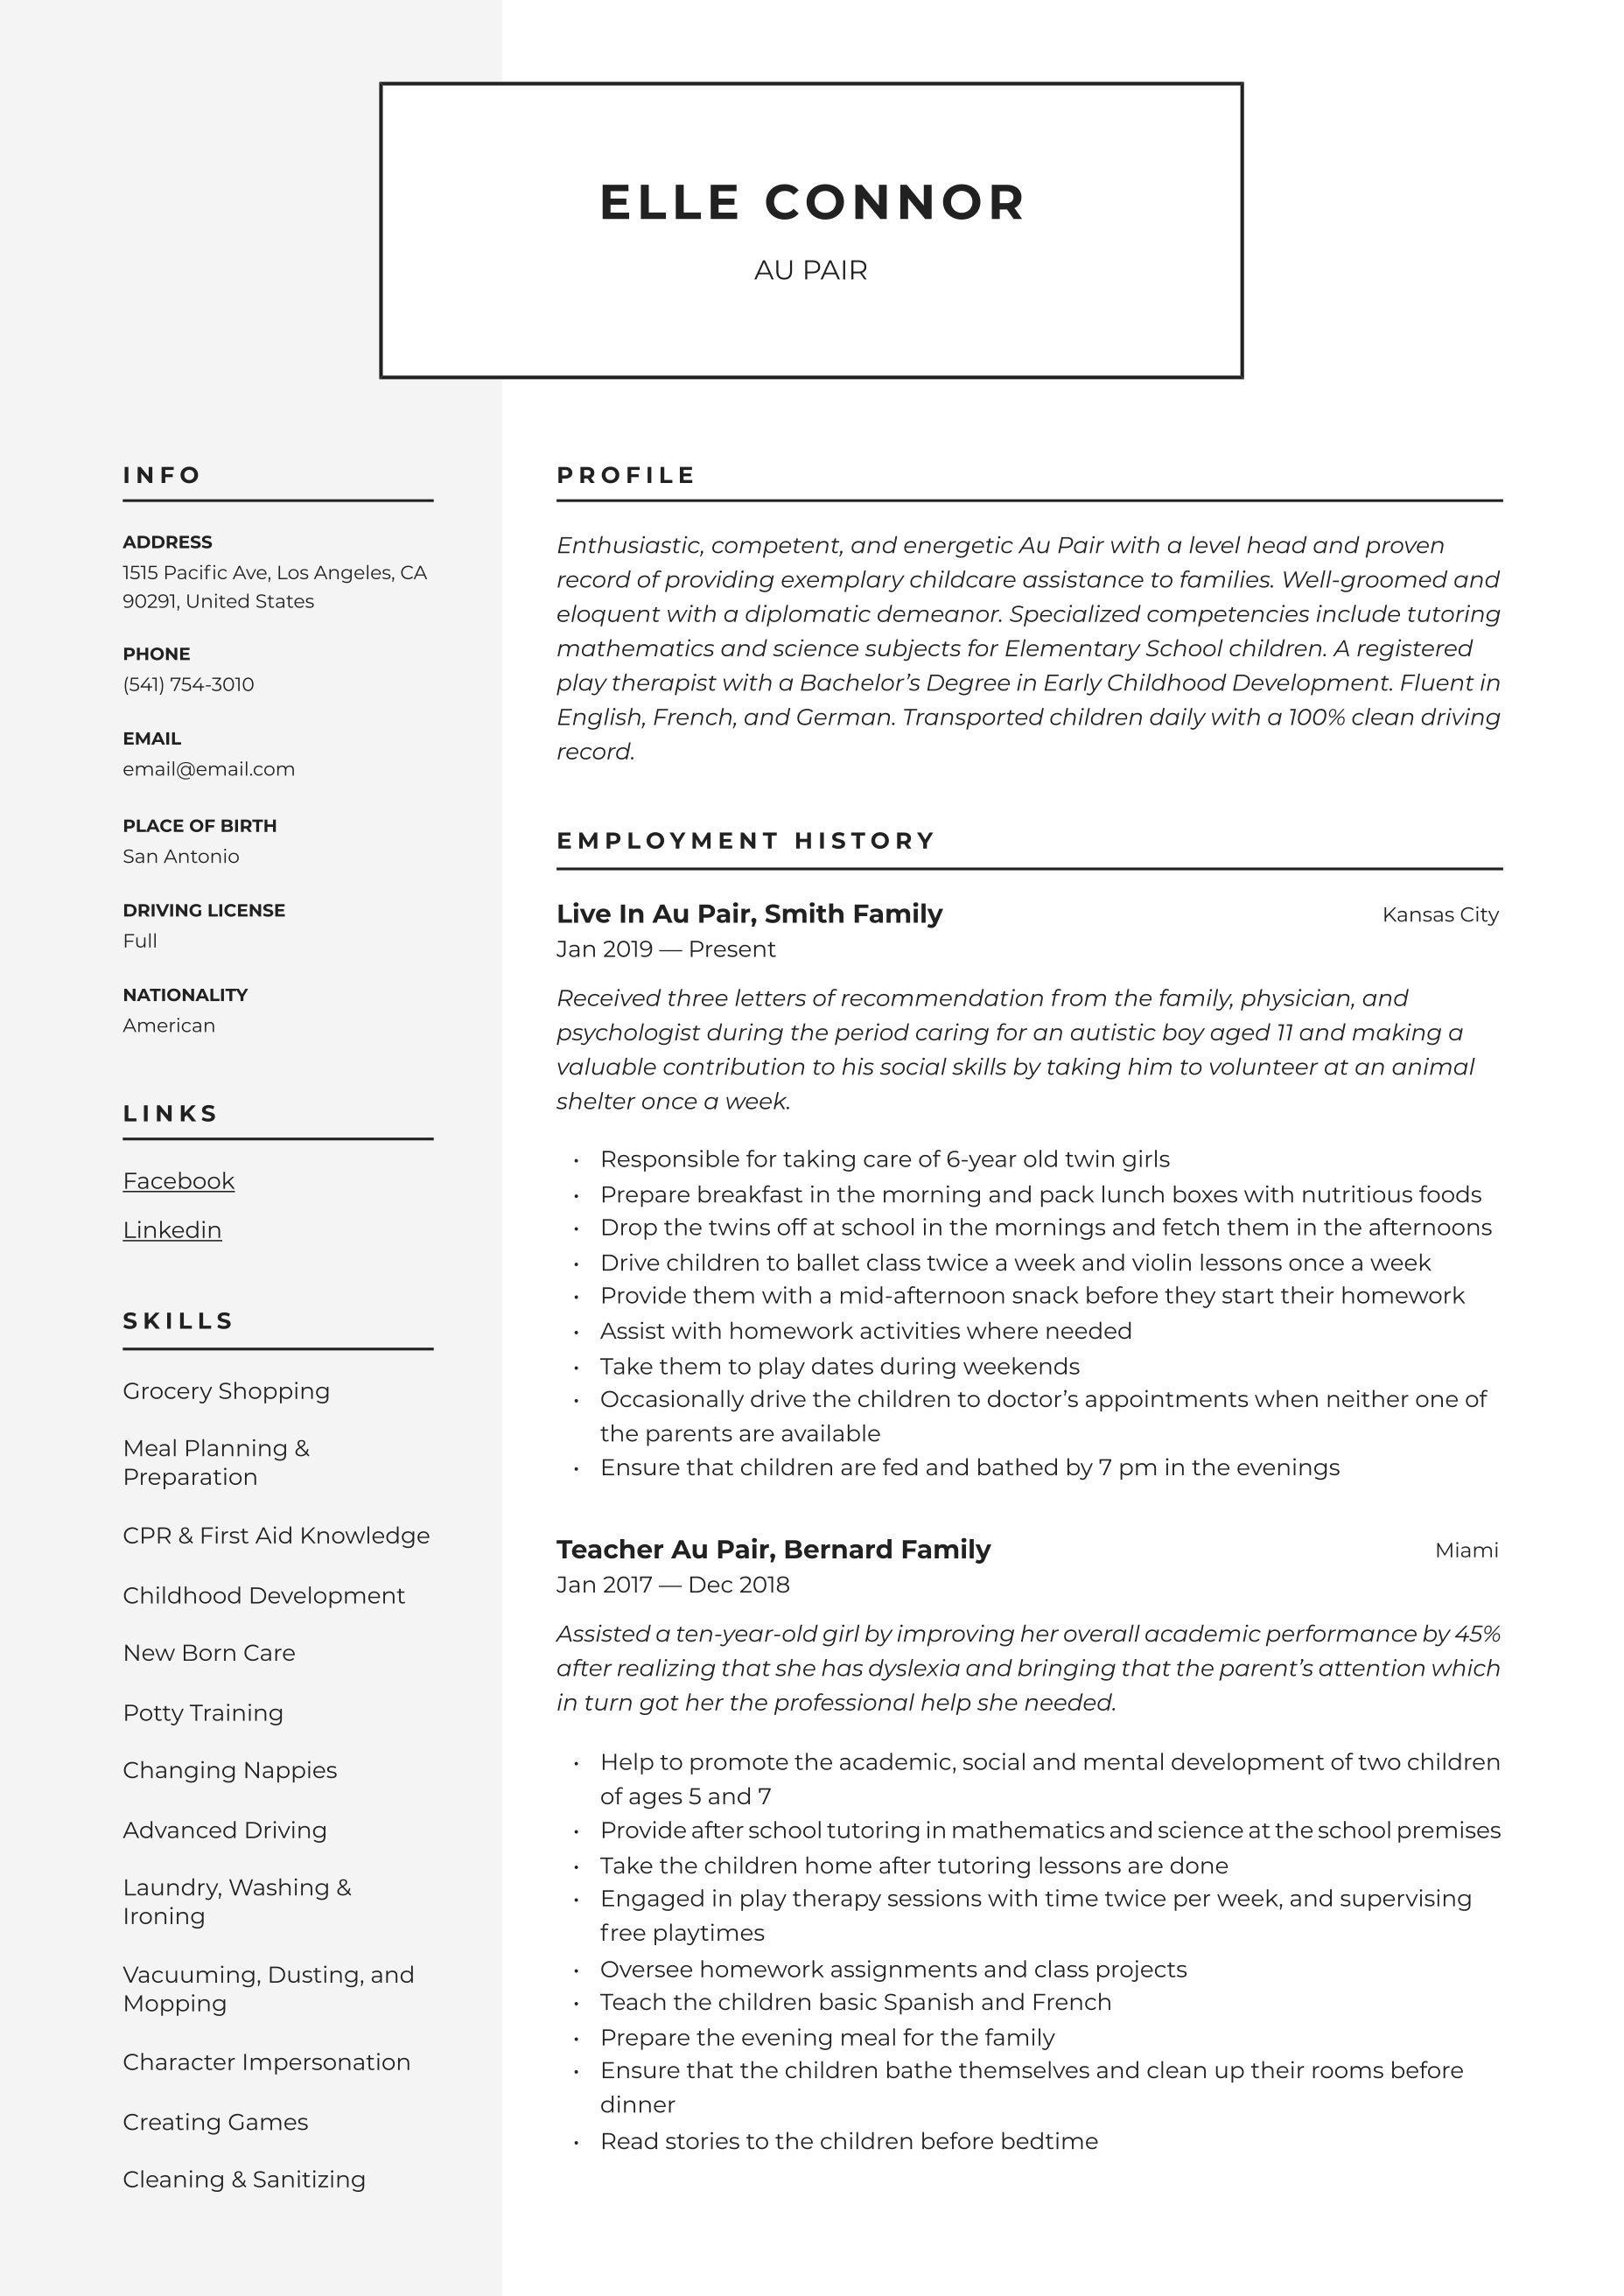 Au pair resume template in 2020 resume guide server